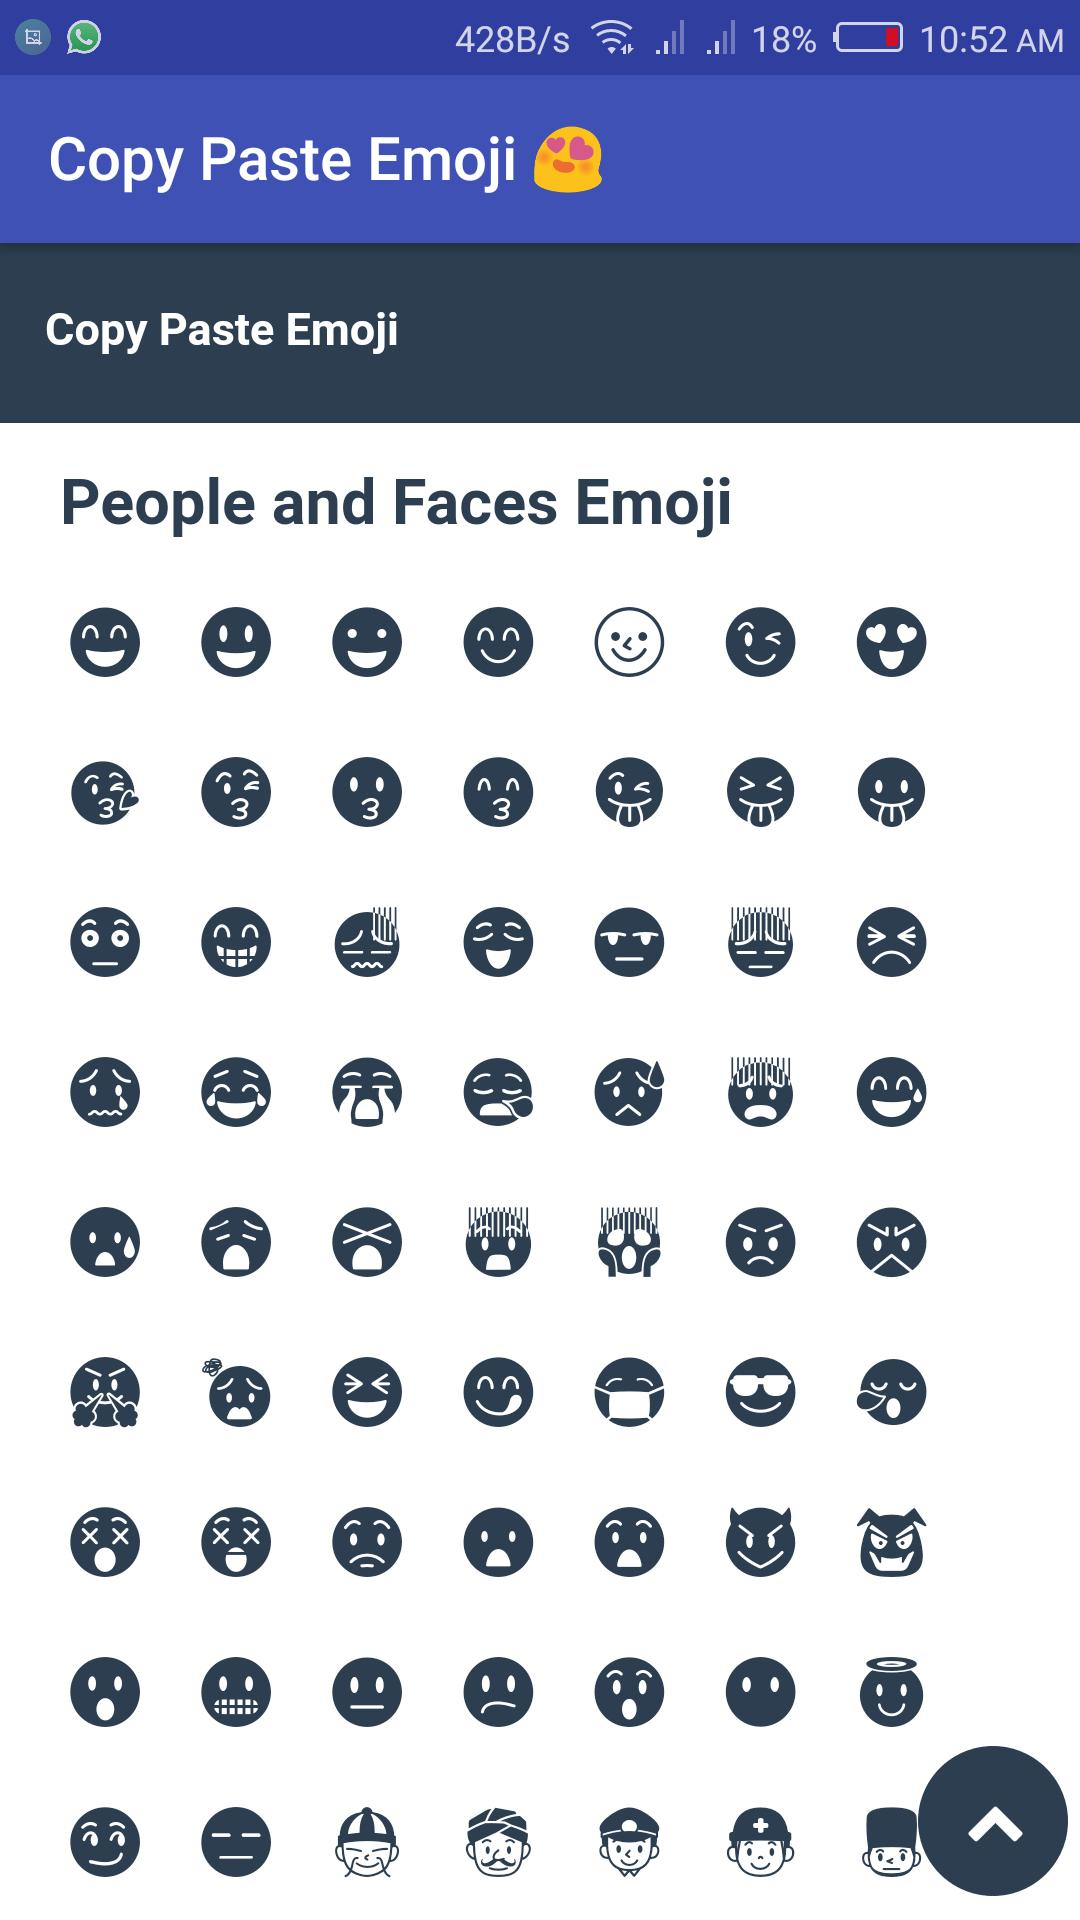 Copy Paste Emoji for Android - APK Download